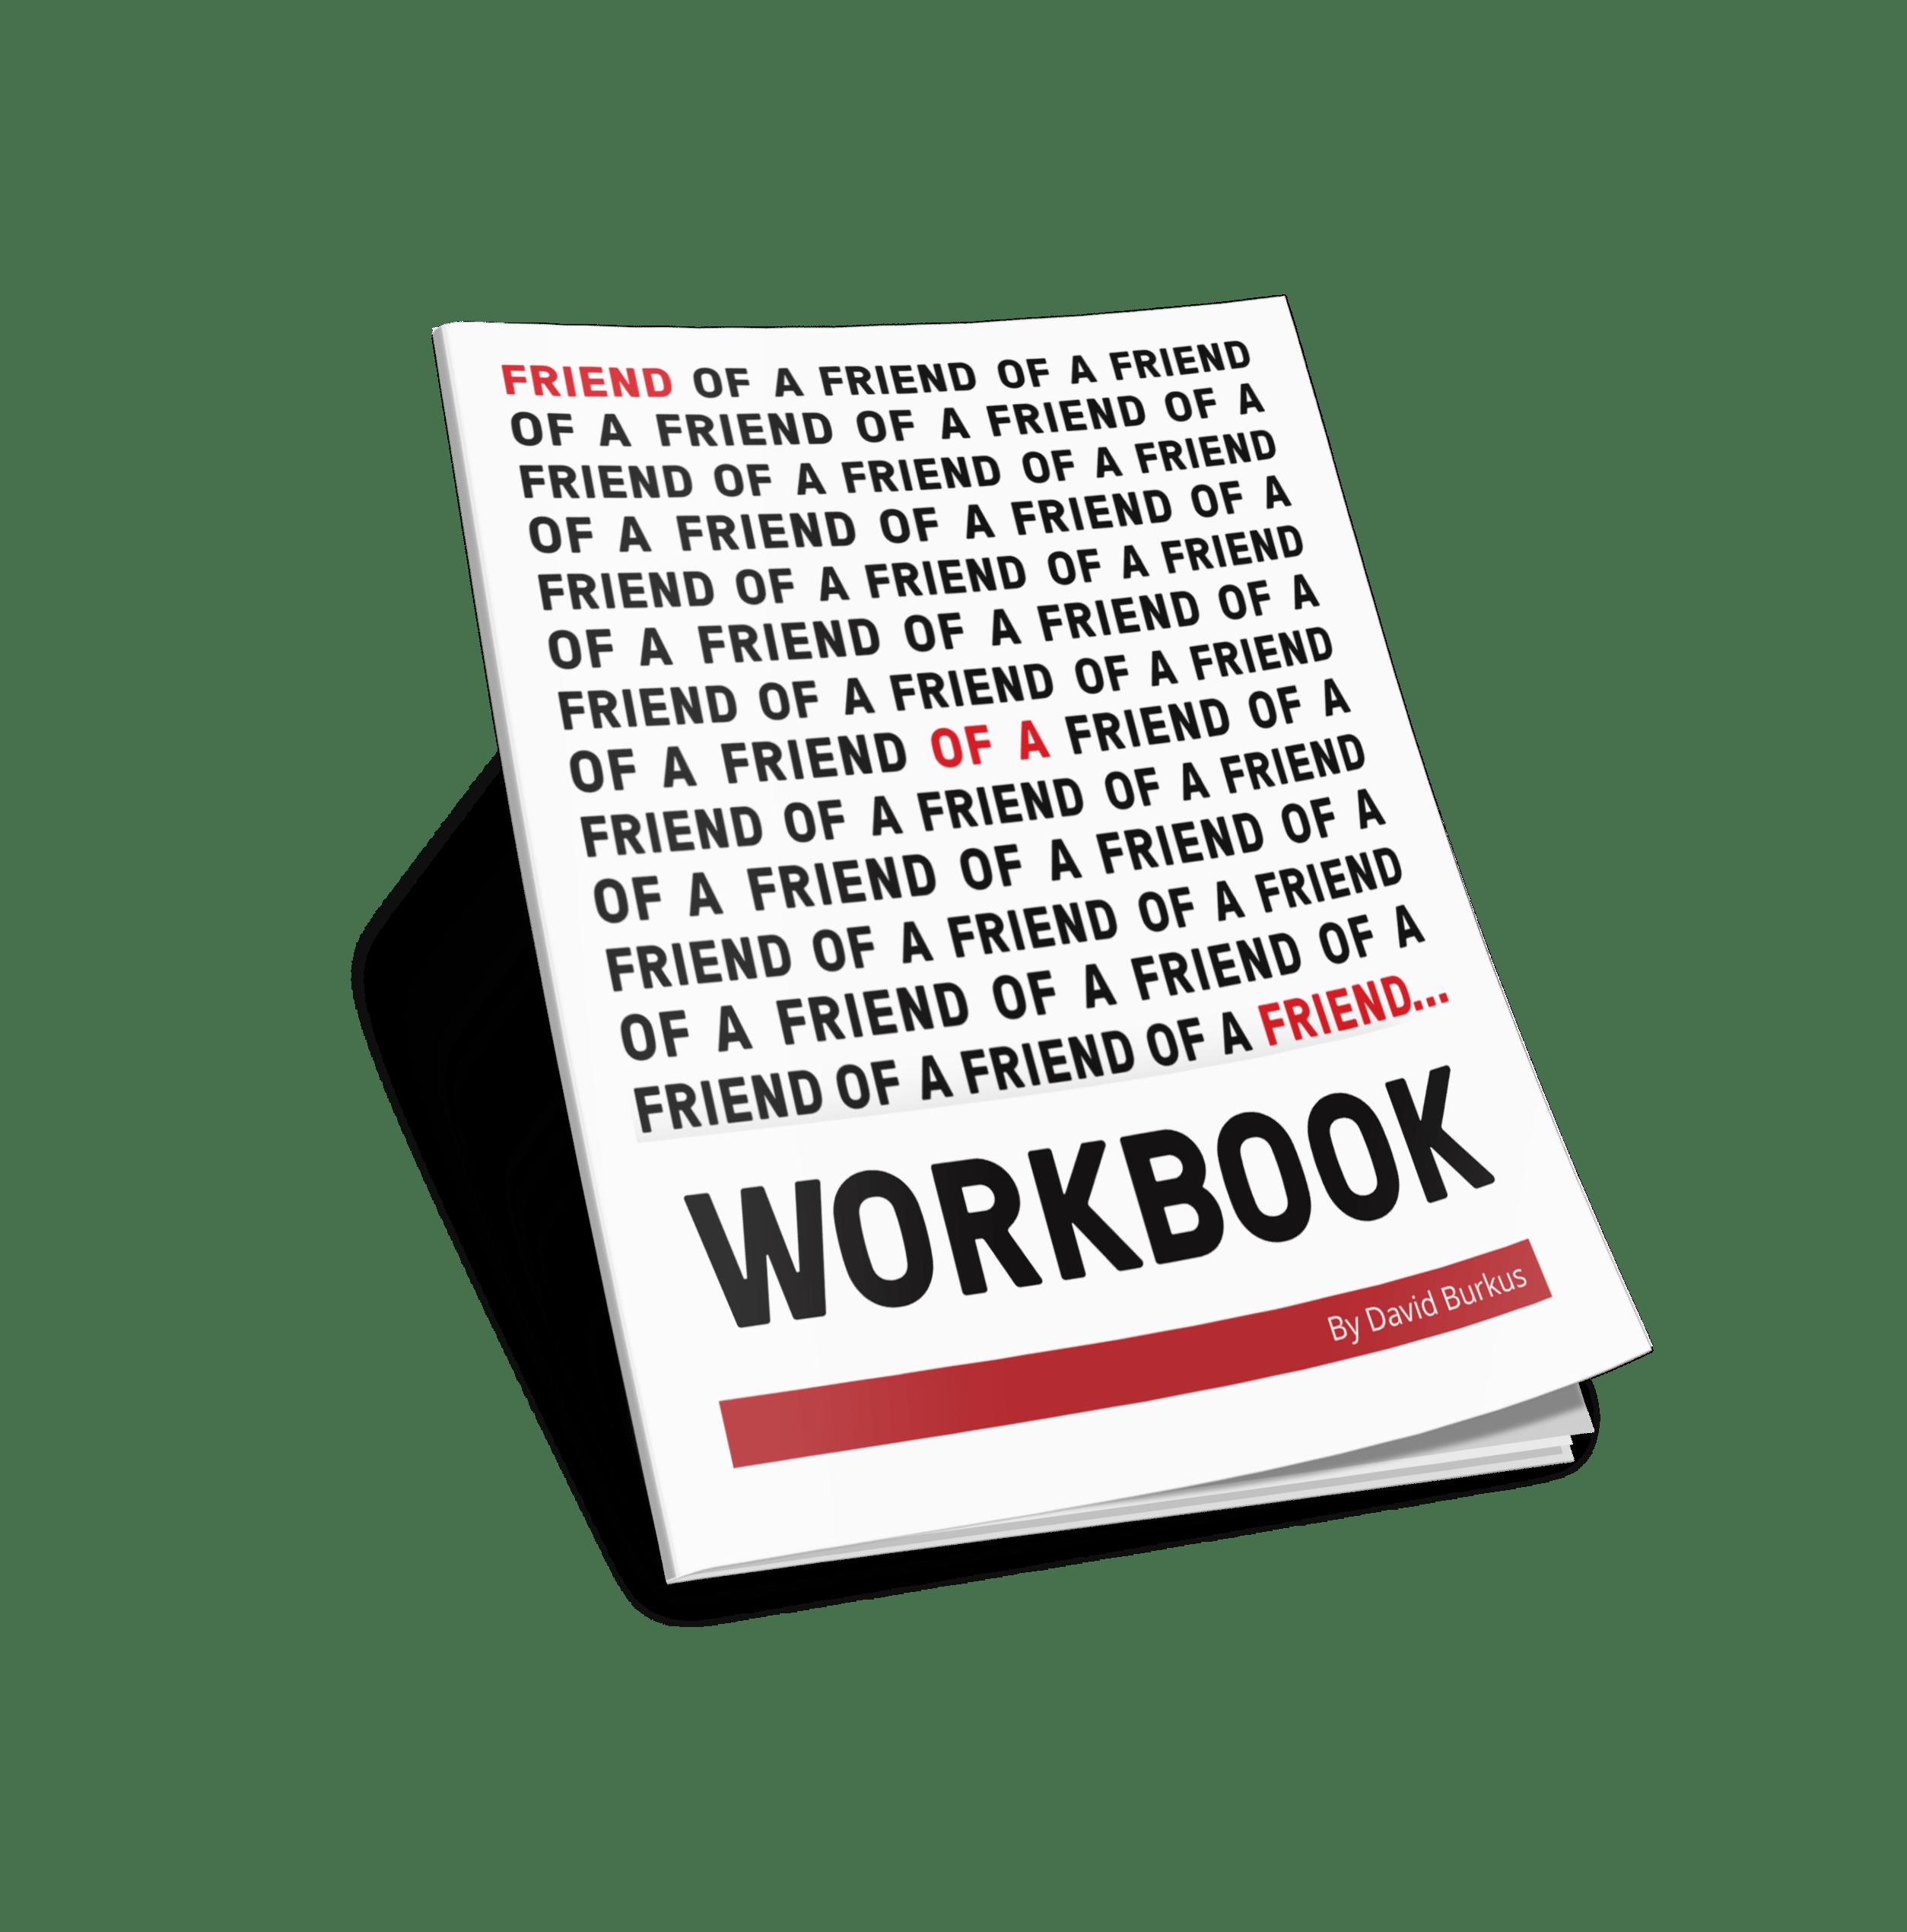 Friend Of A Friend Workbook David Burkus